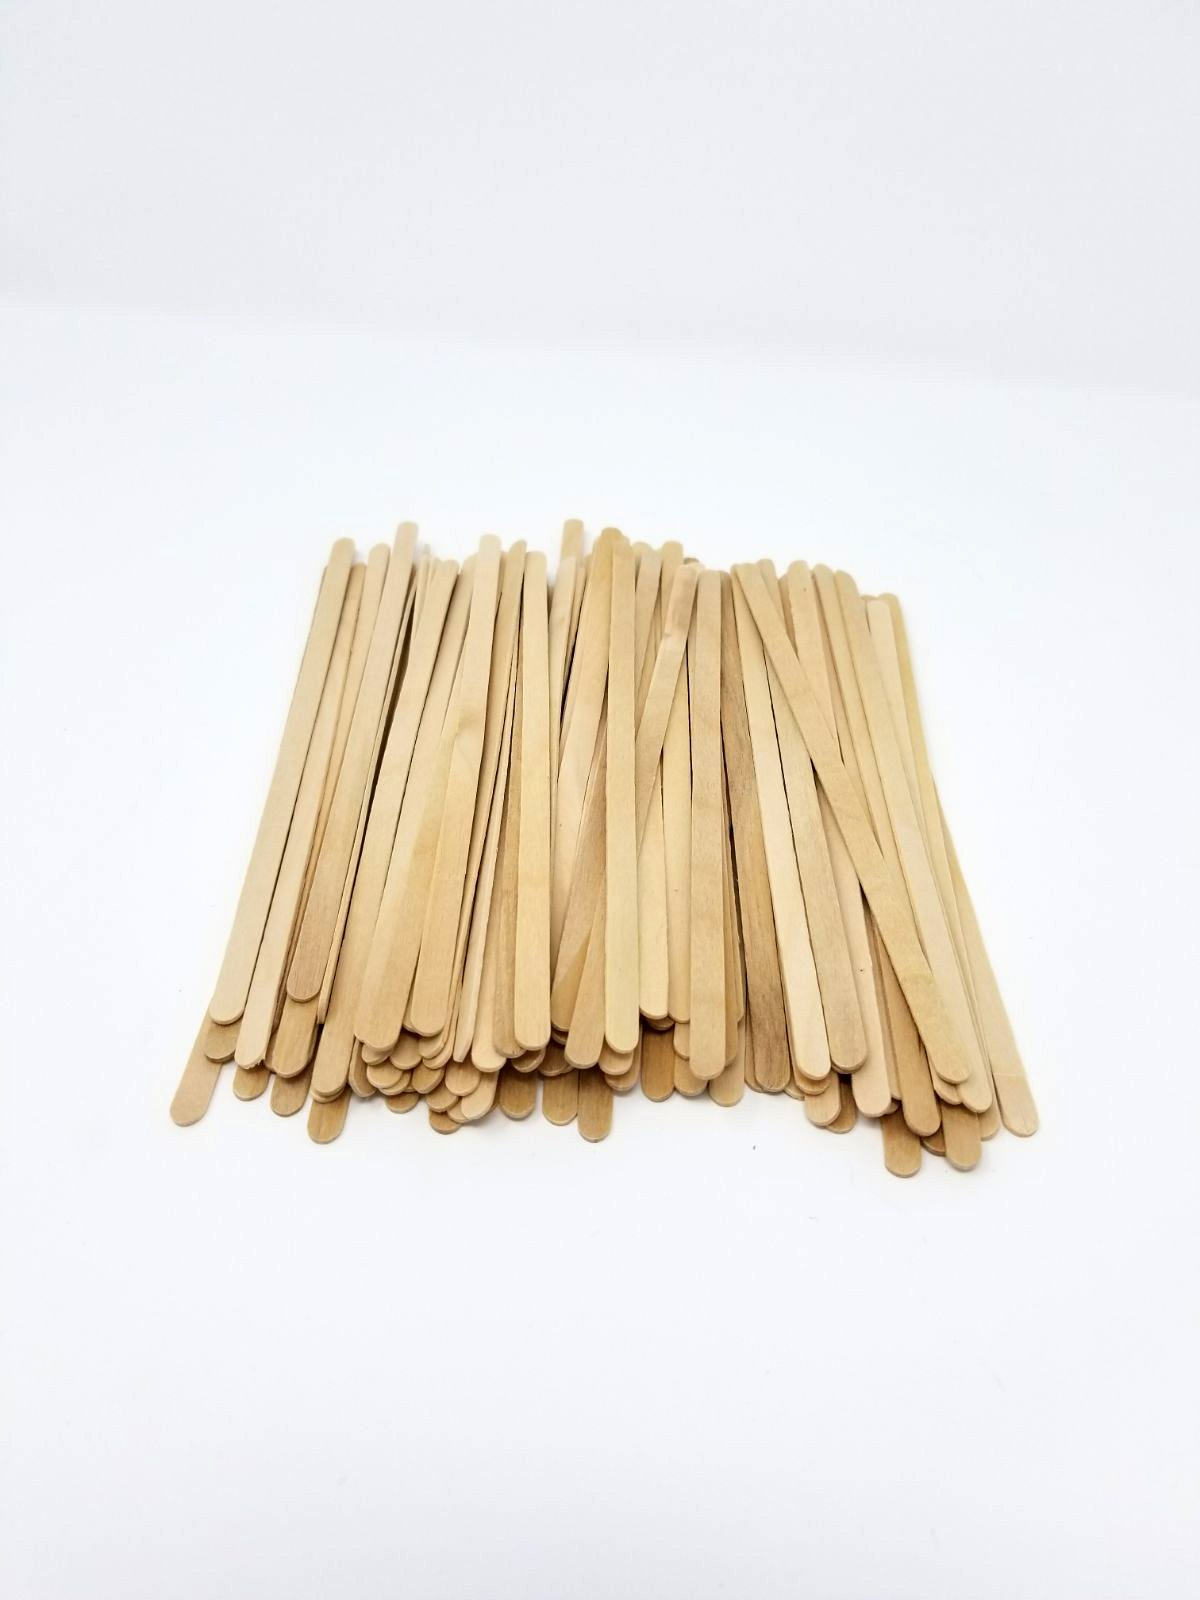 Solo Birch Wood Stirrers coffee stir sticks C-10C, 7-Inch (2000)